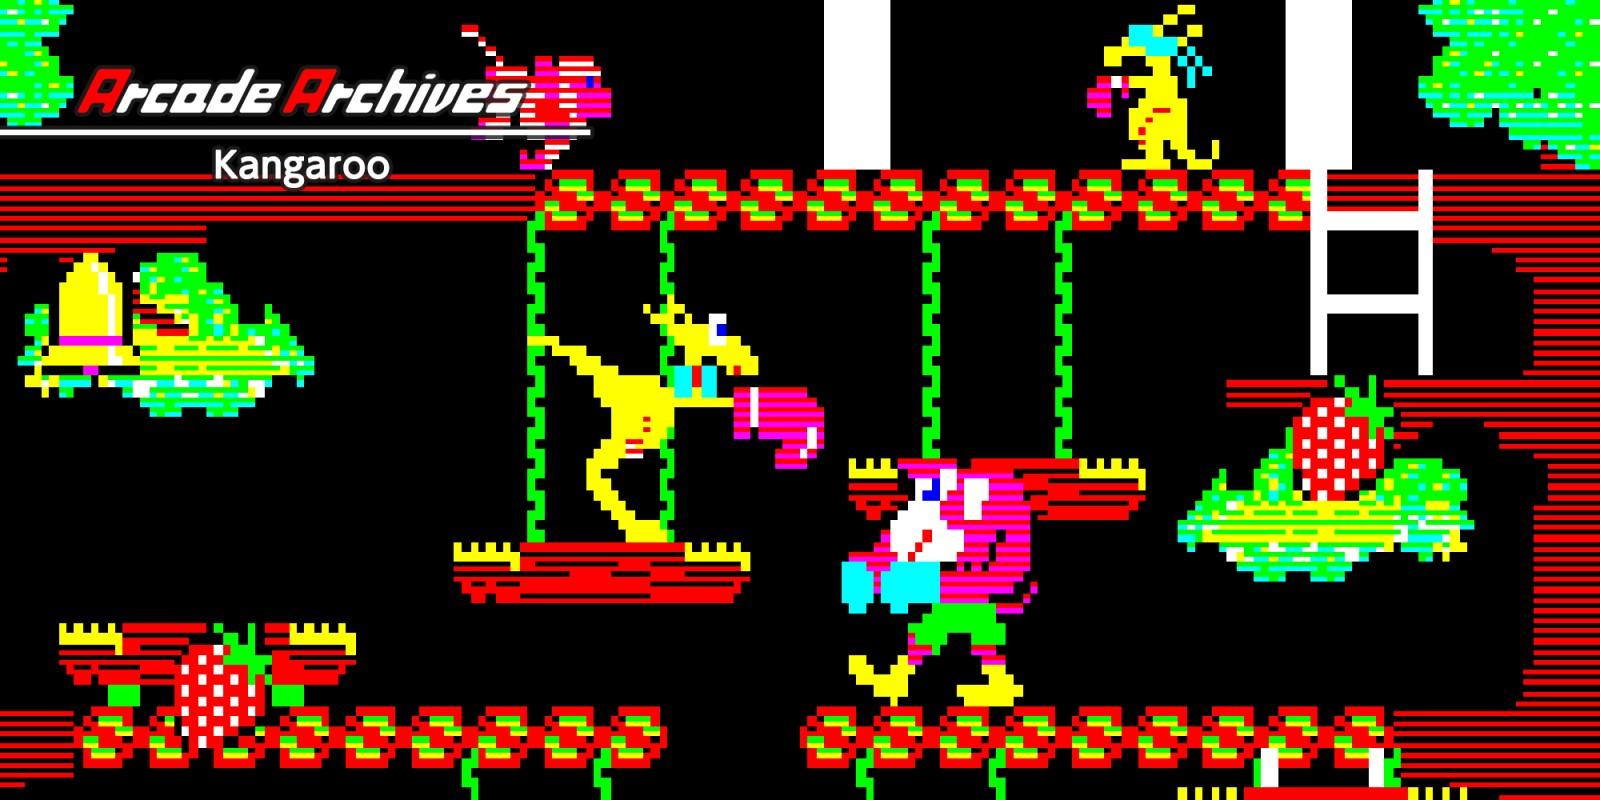 Arcade Archives Kangaroo